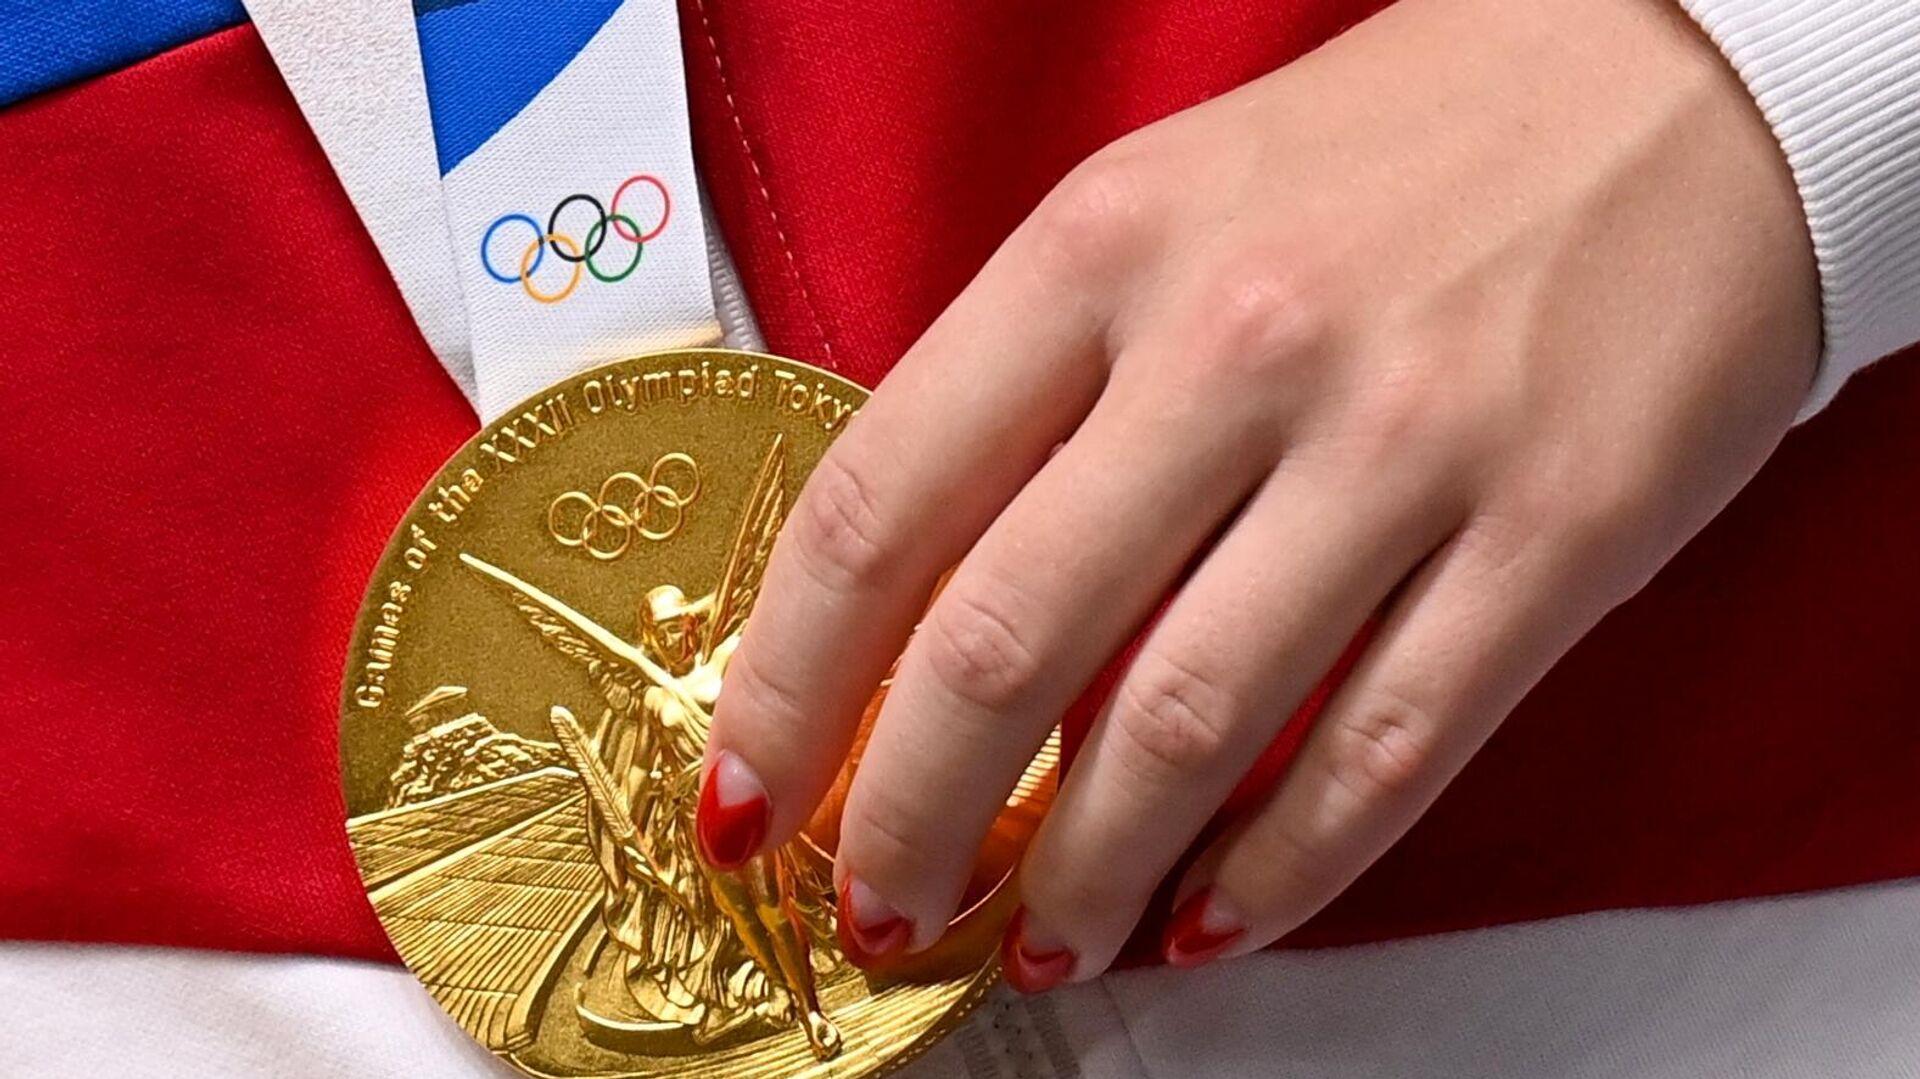 Złoty medal olimpijski, 2021 - Sputnik Polska, 1920, 25.07.2021